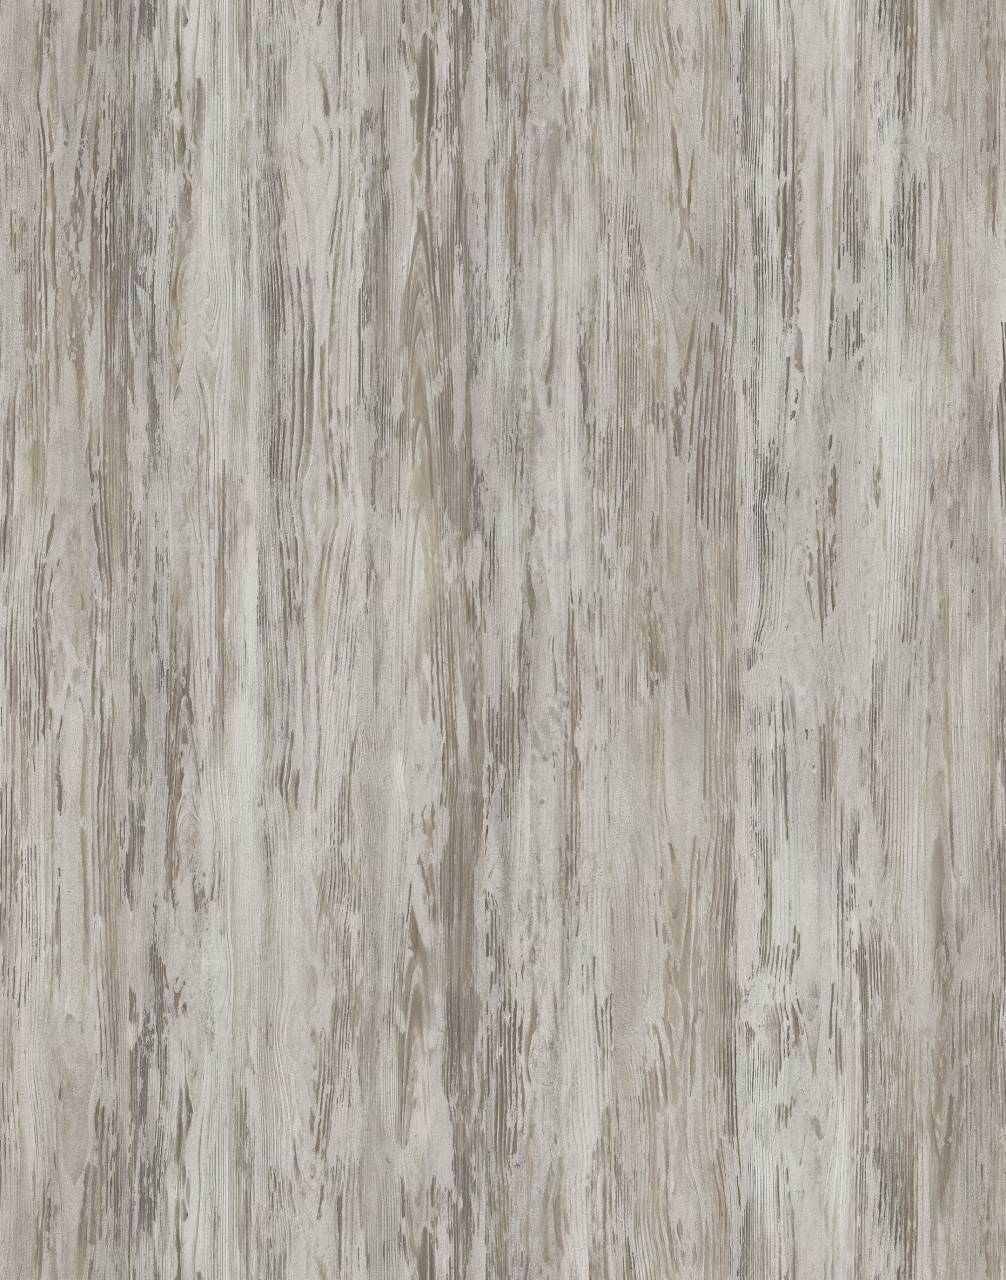 K084 Dark Artwood (MF PB sample)